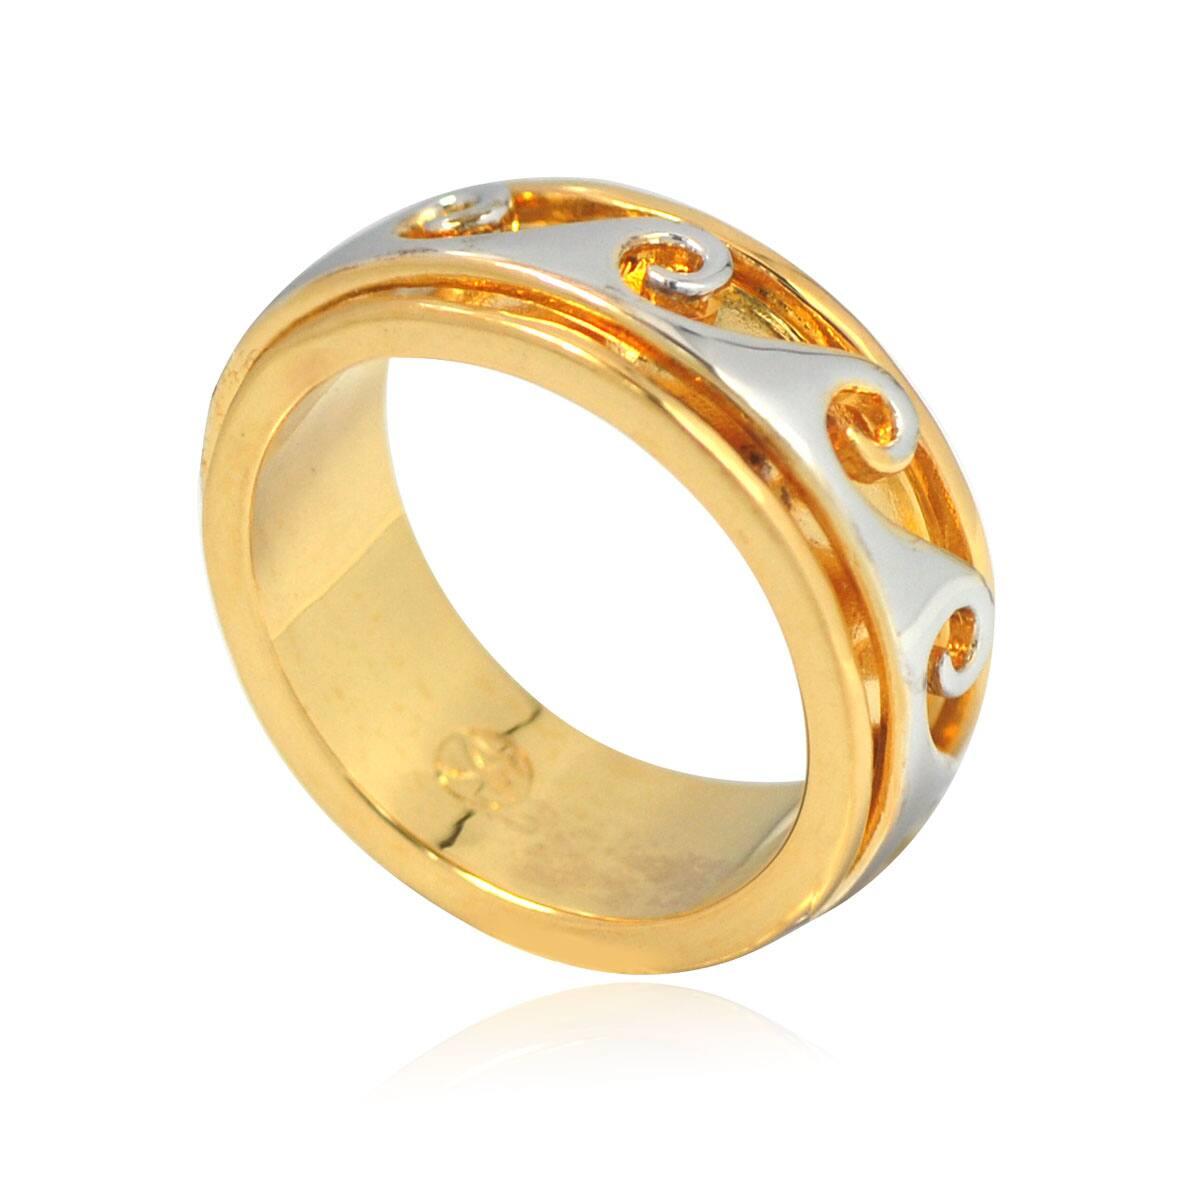 De Buman 14k Gold Overlay Men's Band|https://ak1.ostkcdn.com/images/products/8119521/82/460/De-Buman-14k-Gold-Overlay-Mens-Band-P15466582.jpg?impolicy=medium